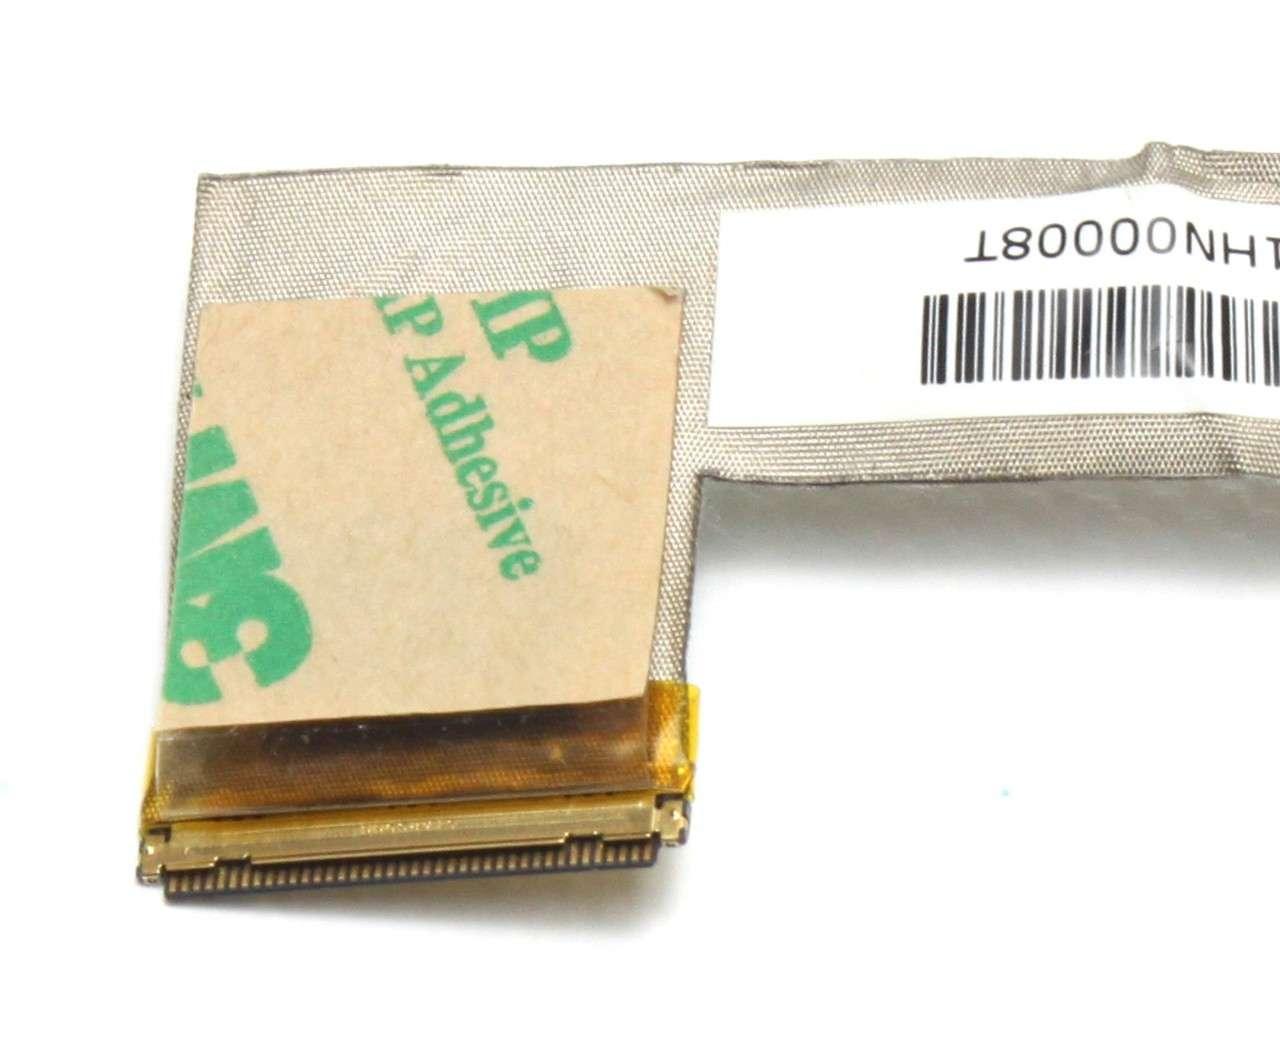 Cablu video LVDS Asus G53JW imagine powerlaptop.ro 2021